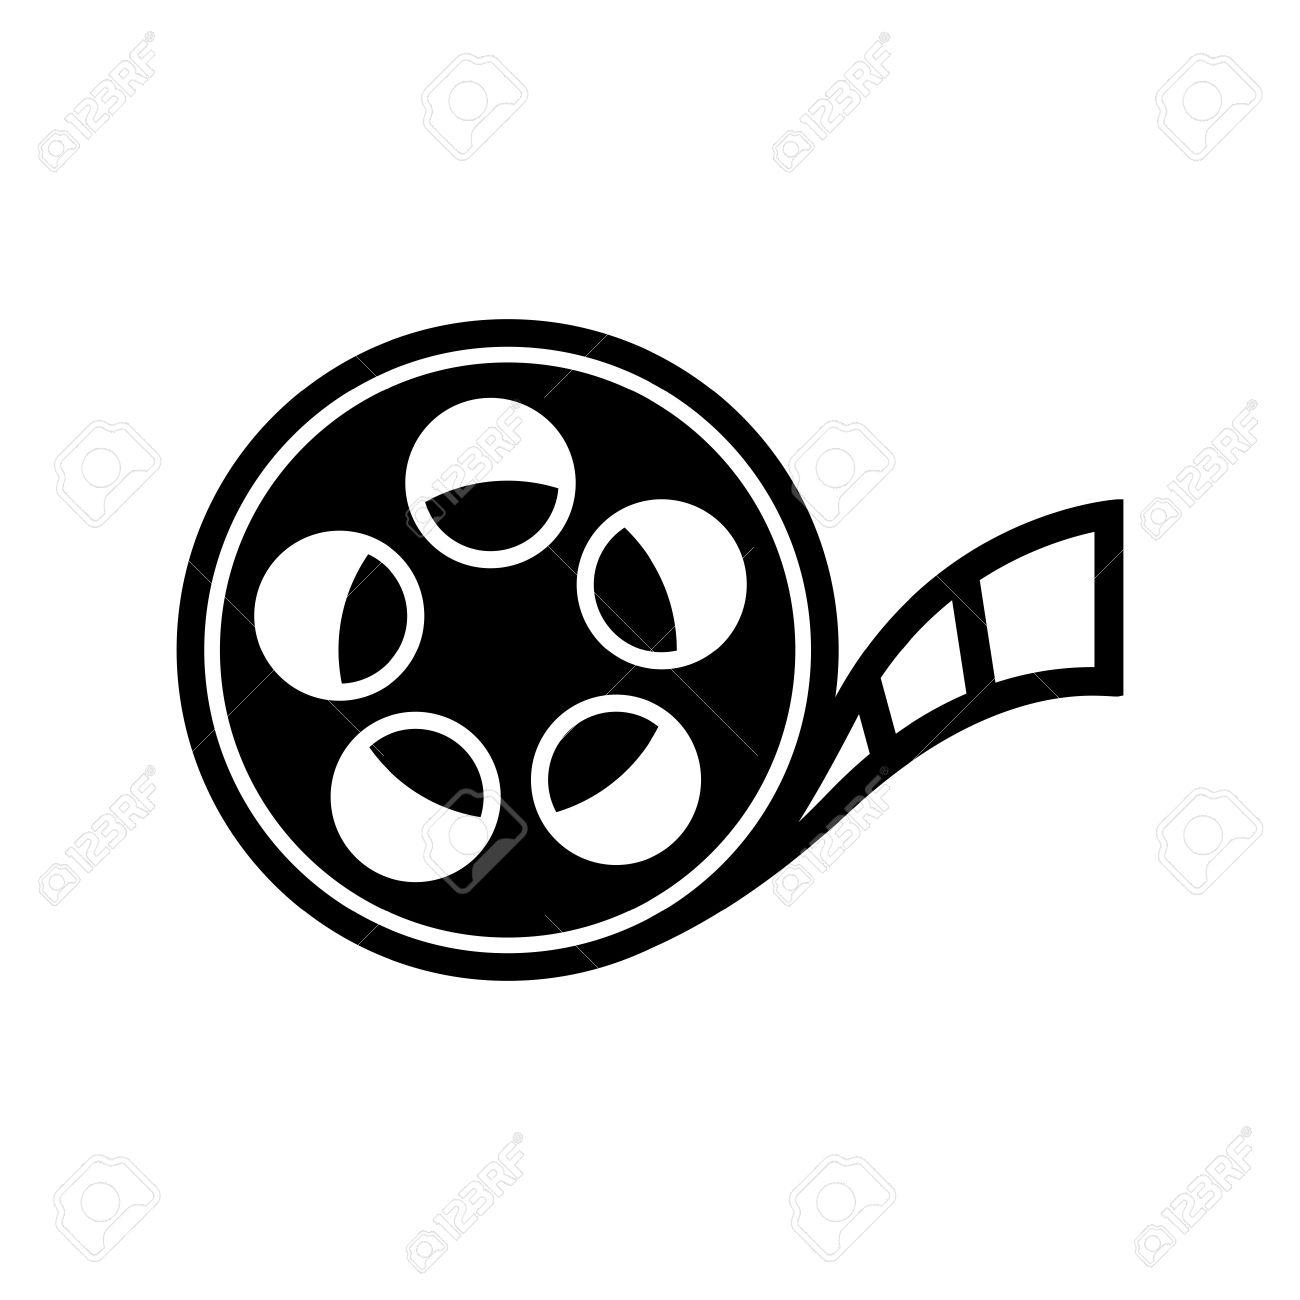 545 Film Reel free clipart.